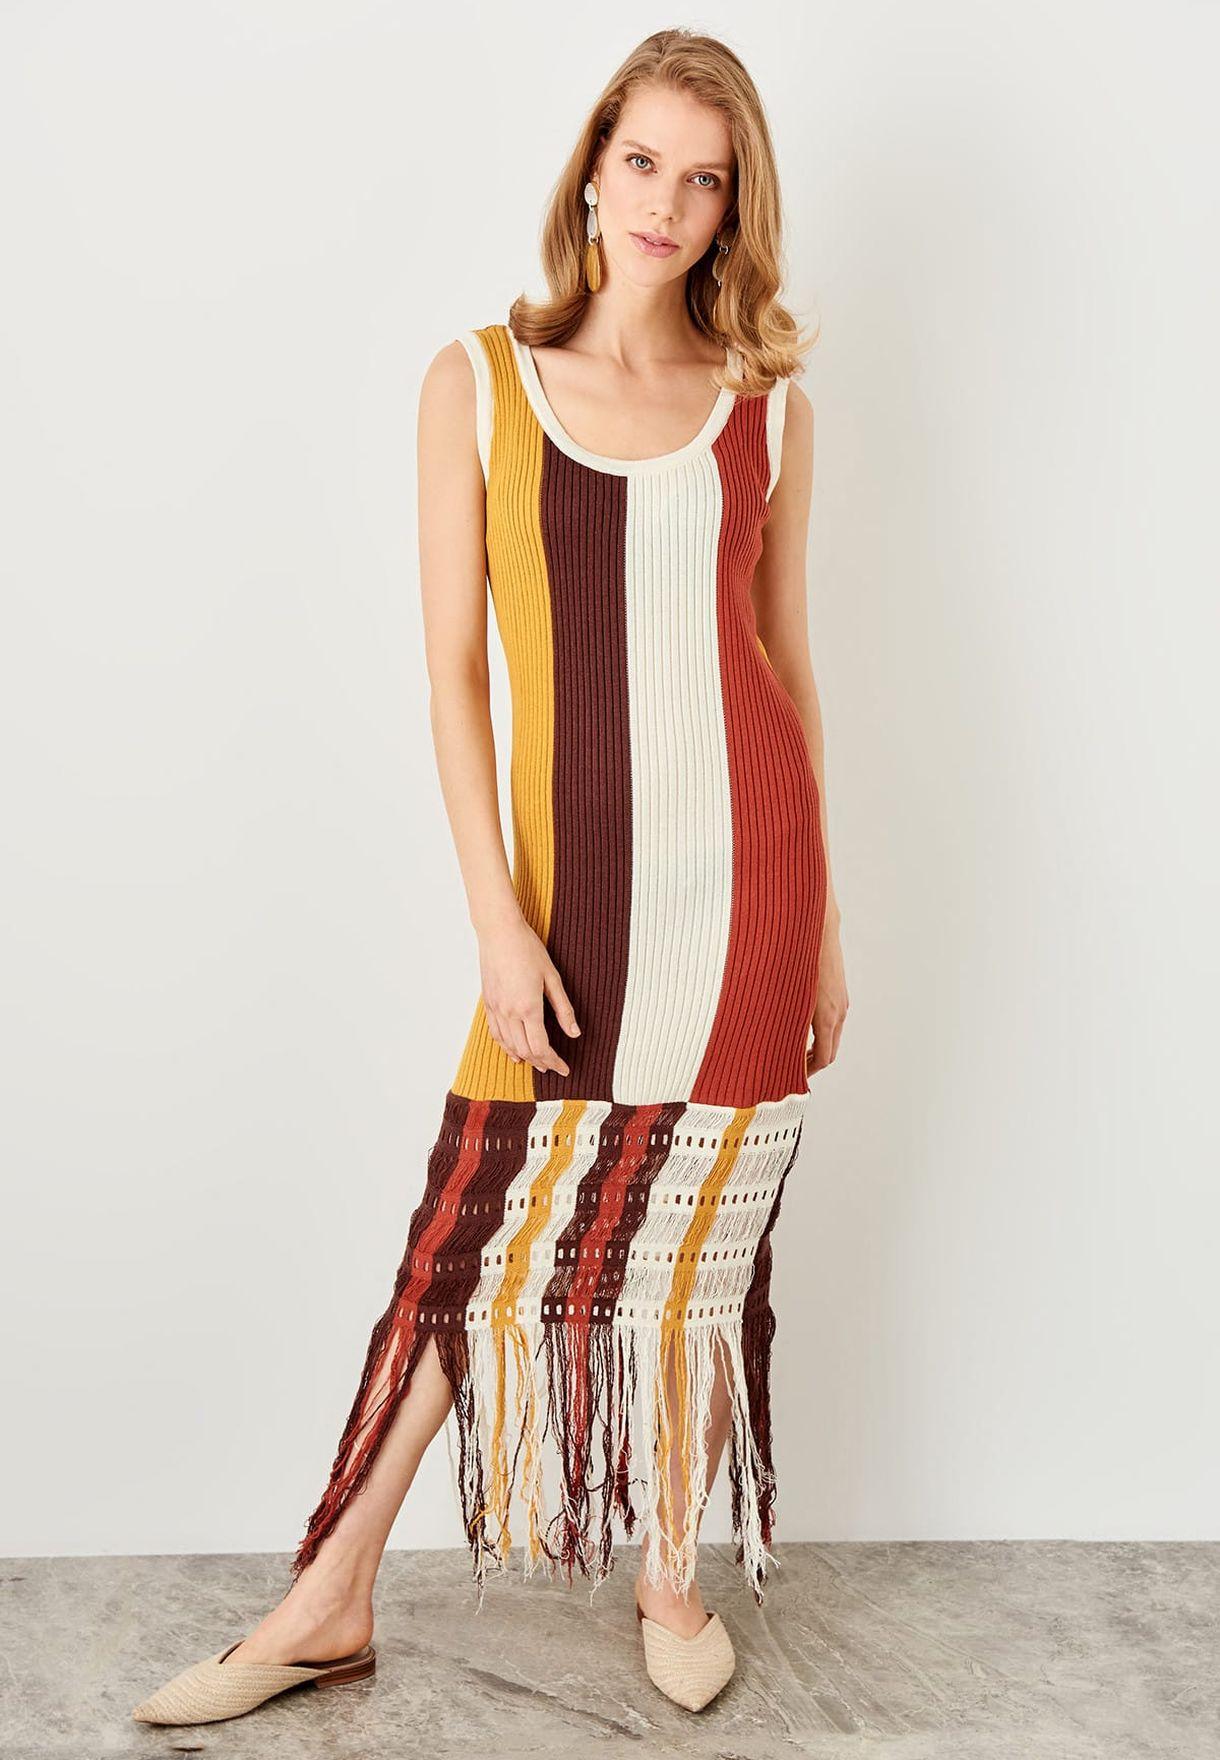 68f781a01c5 Shop Trendyol stripes Striped Tassel Sweat Dress TCLSS19FV0069 for ...